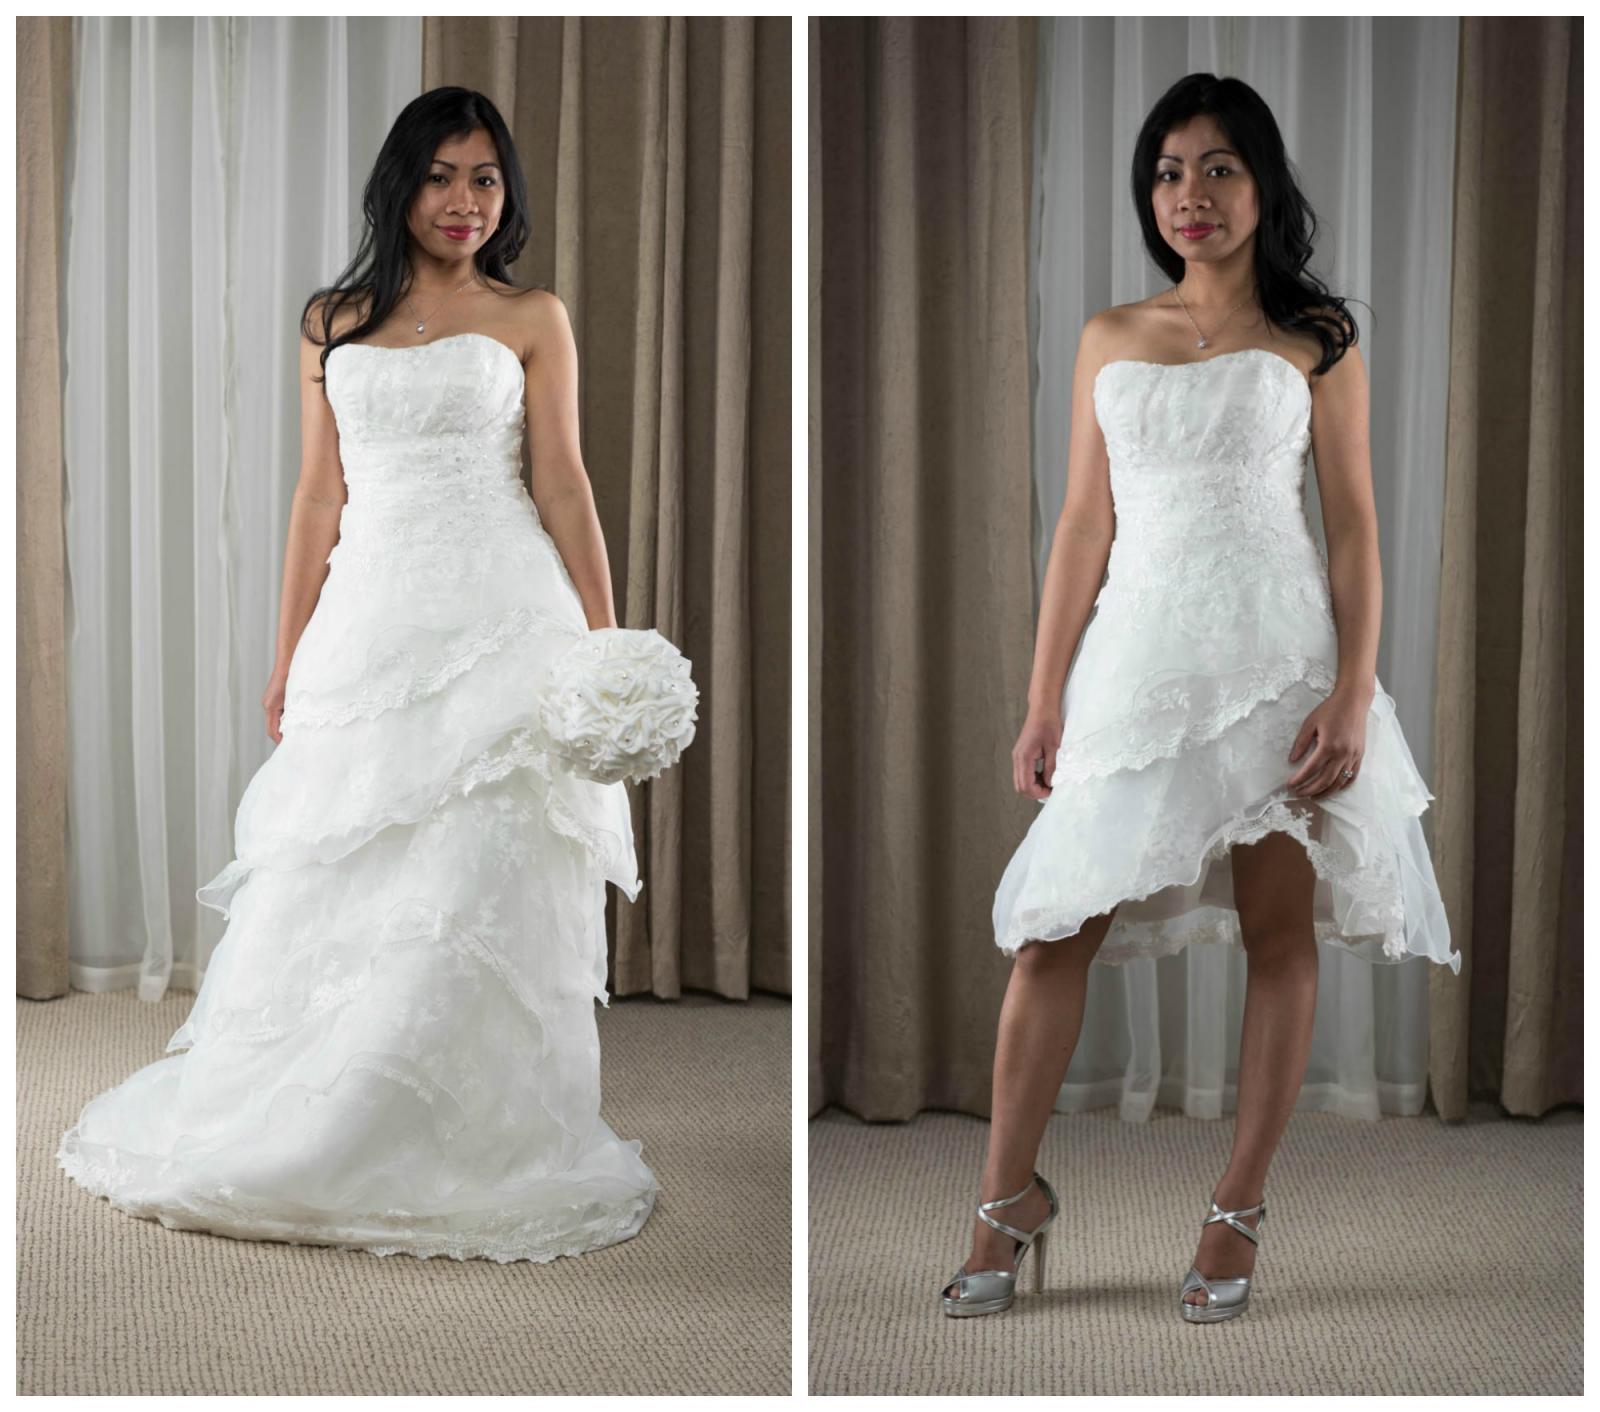 Bridal Dresses, Sova Enterprises